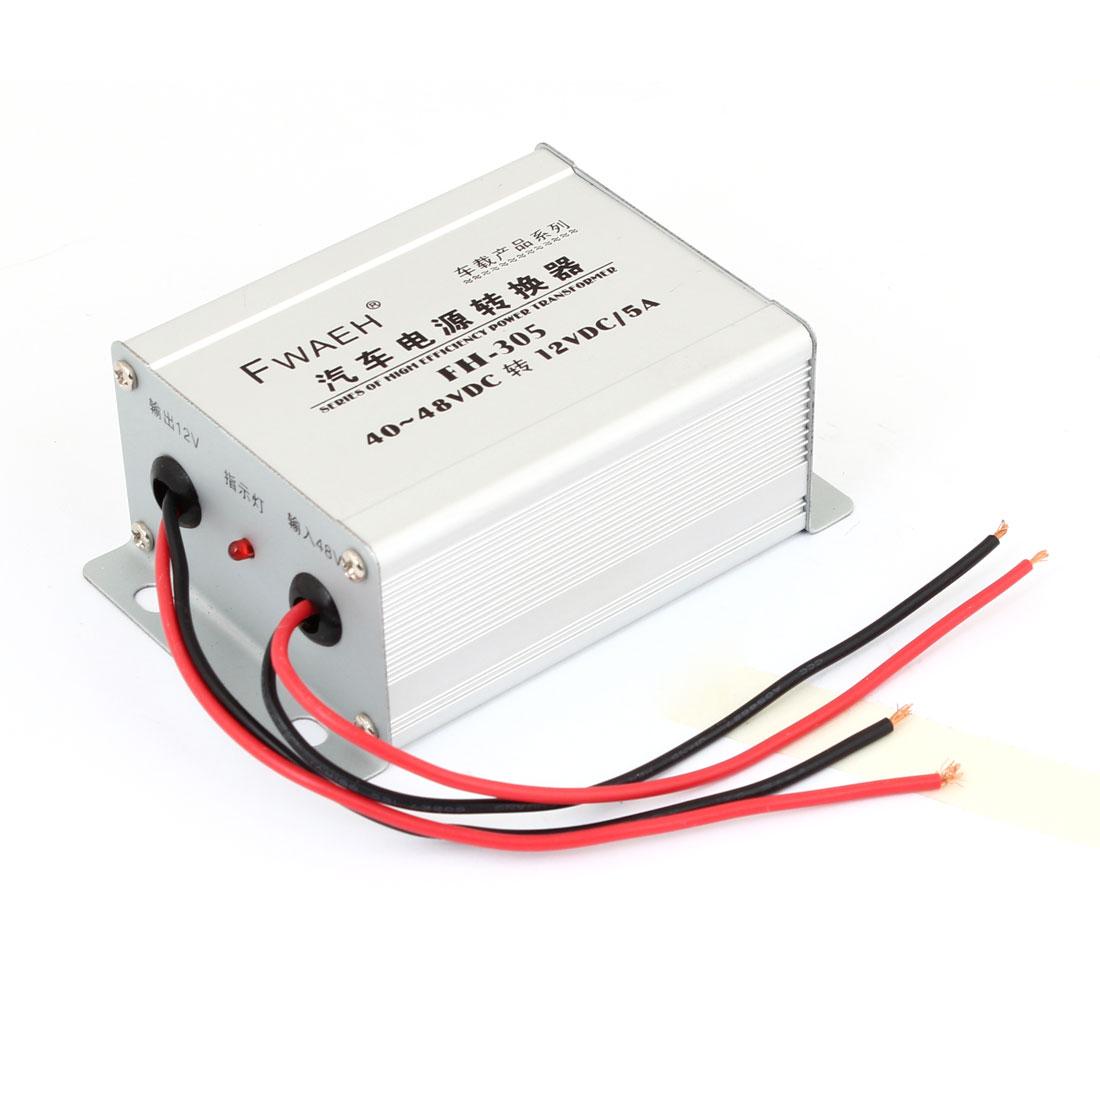 Car Auto Pre-wired DC 40-48V to DC 12V 5A Voltage Power Transformer